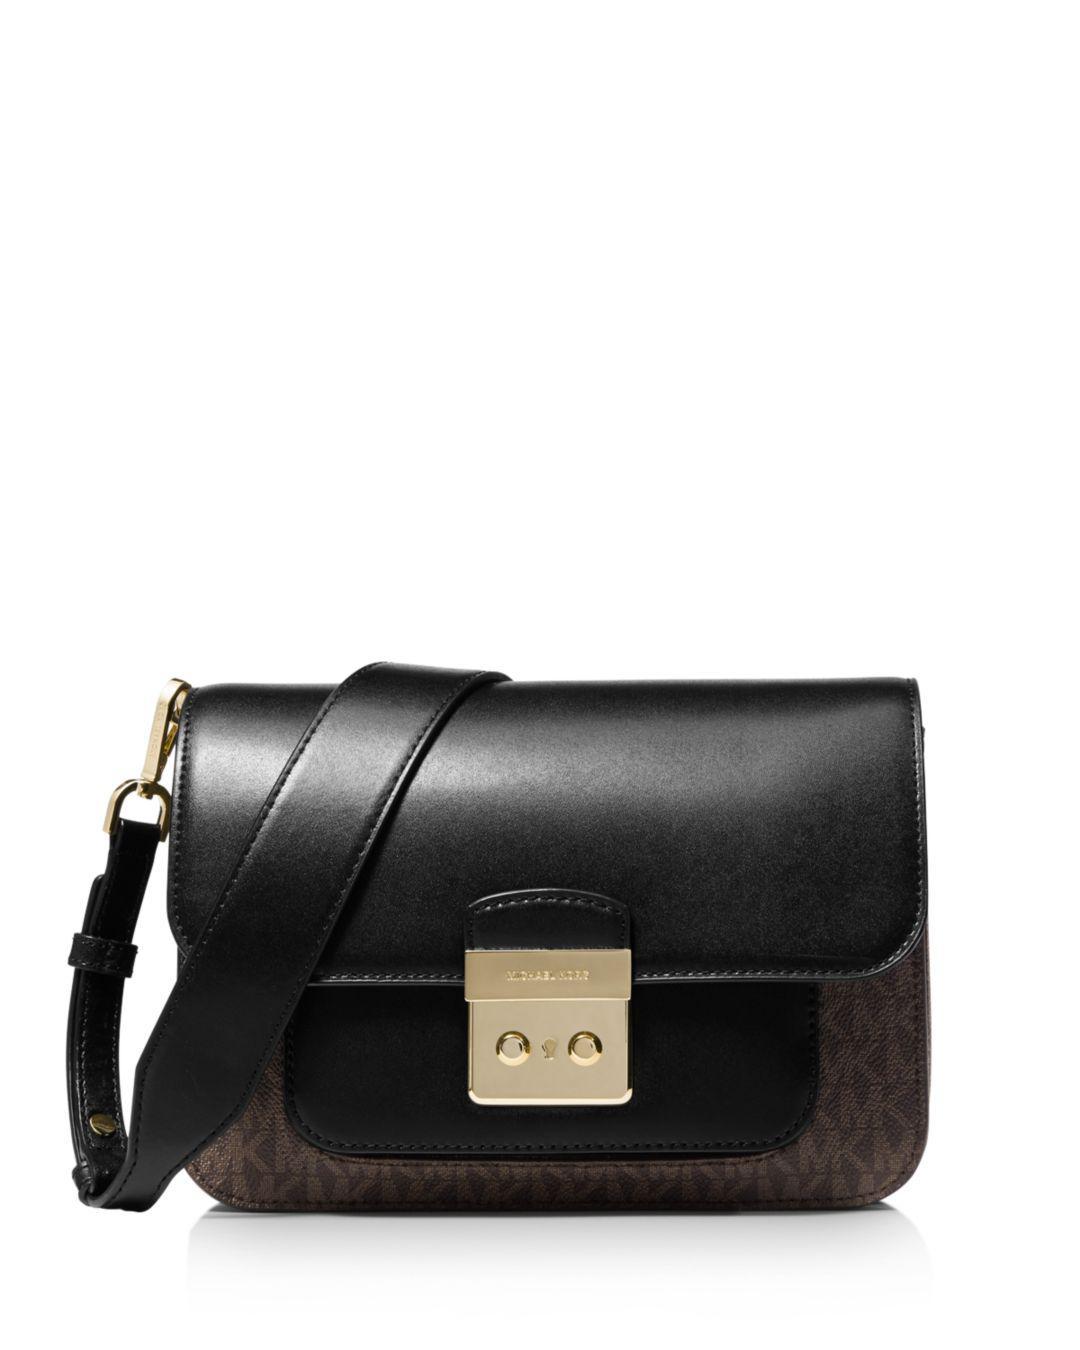 77c364ddb4f9 Michael Kors. Women s Black Michael Sloan Editor Signature Colorblock  Shoulder Bag